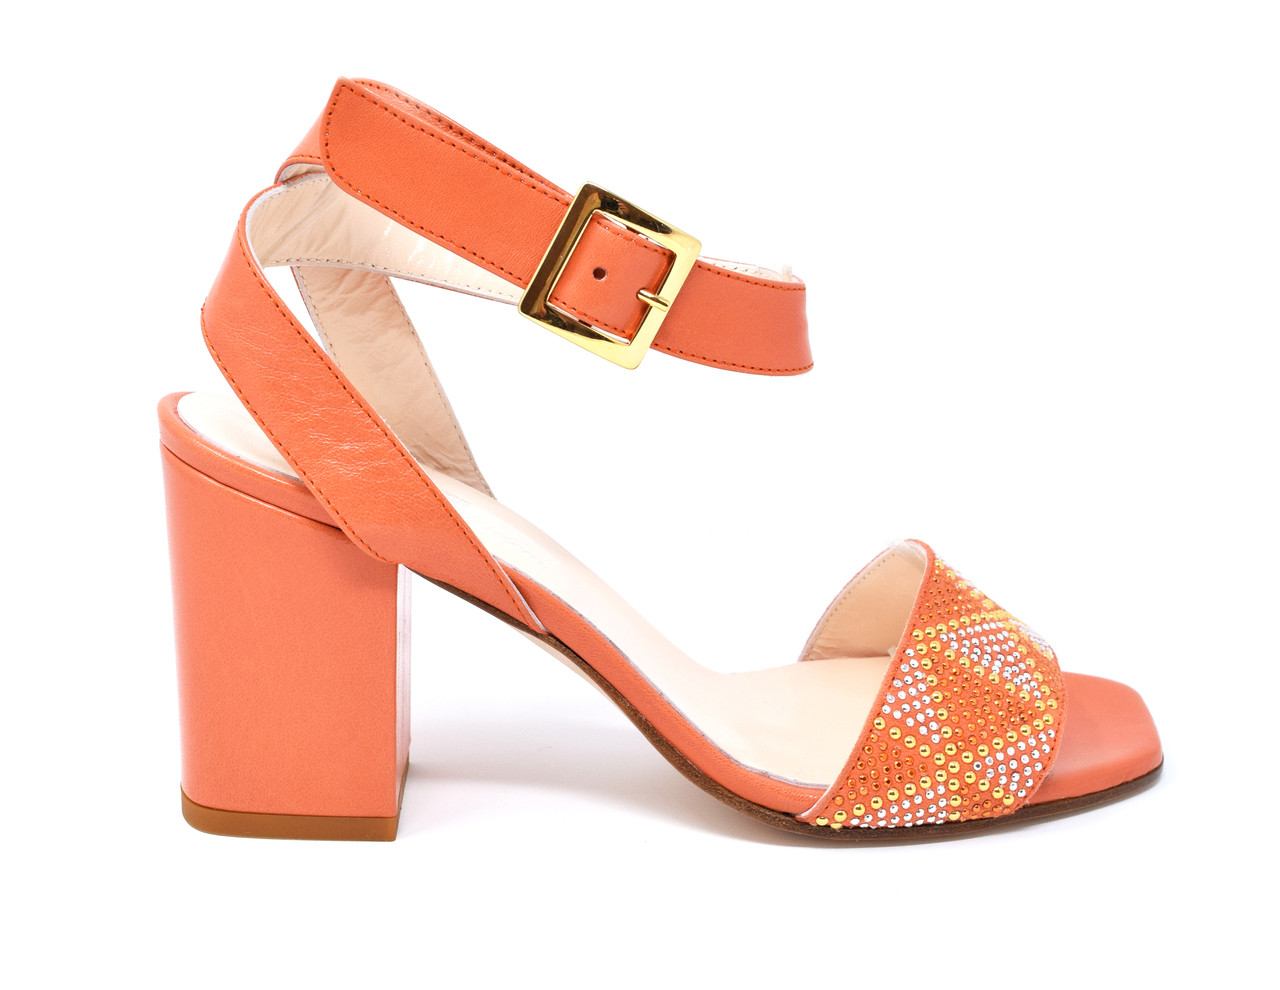 894631f4ce2c Clara - Block Heeled Sandals with Rhinestones